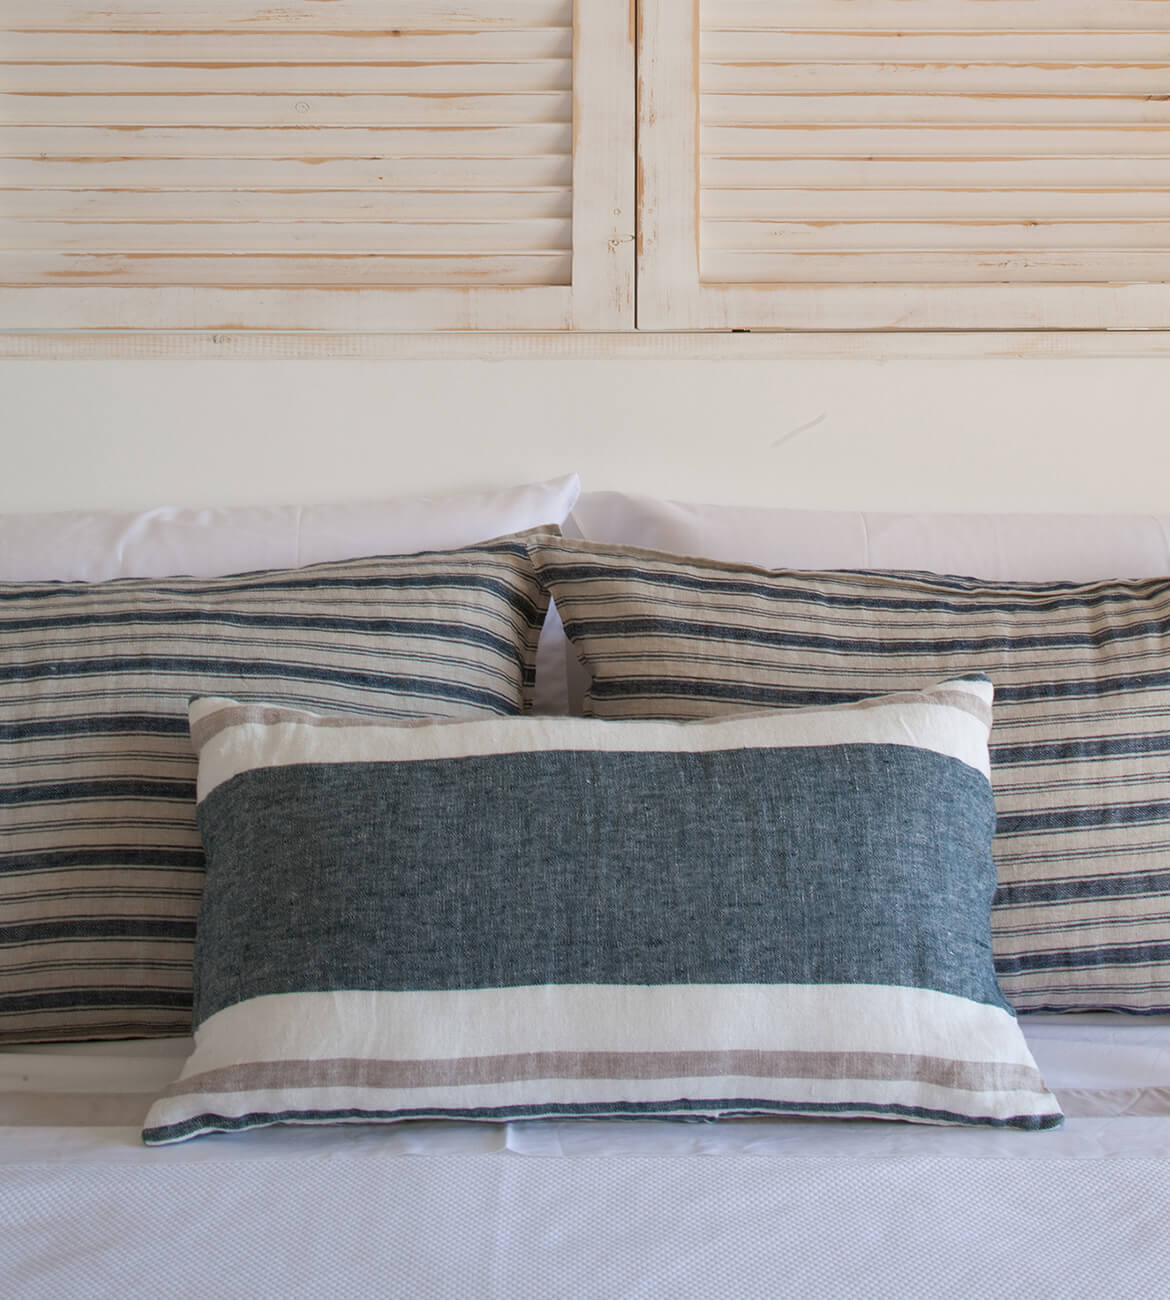 Interiorismo Catalina House Detalle ropa de cama cabecero persiana